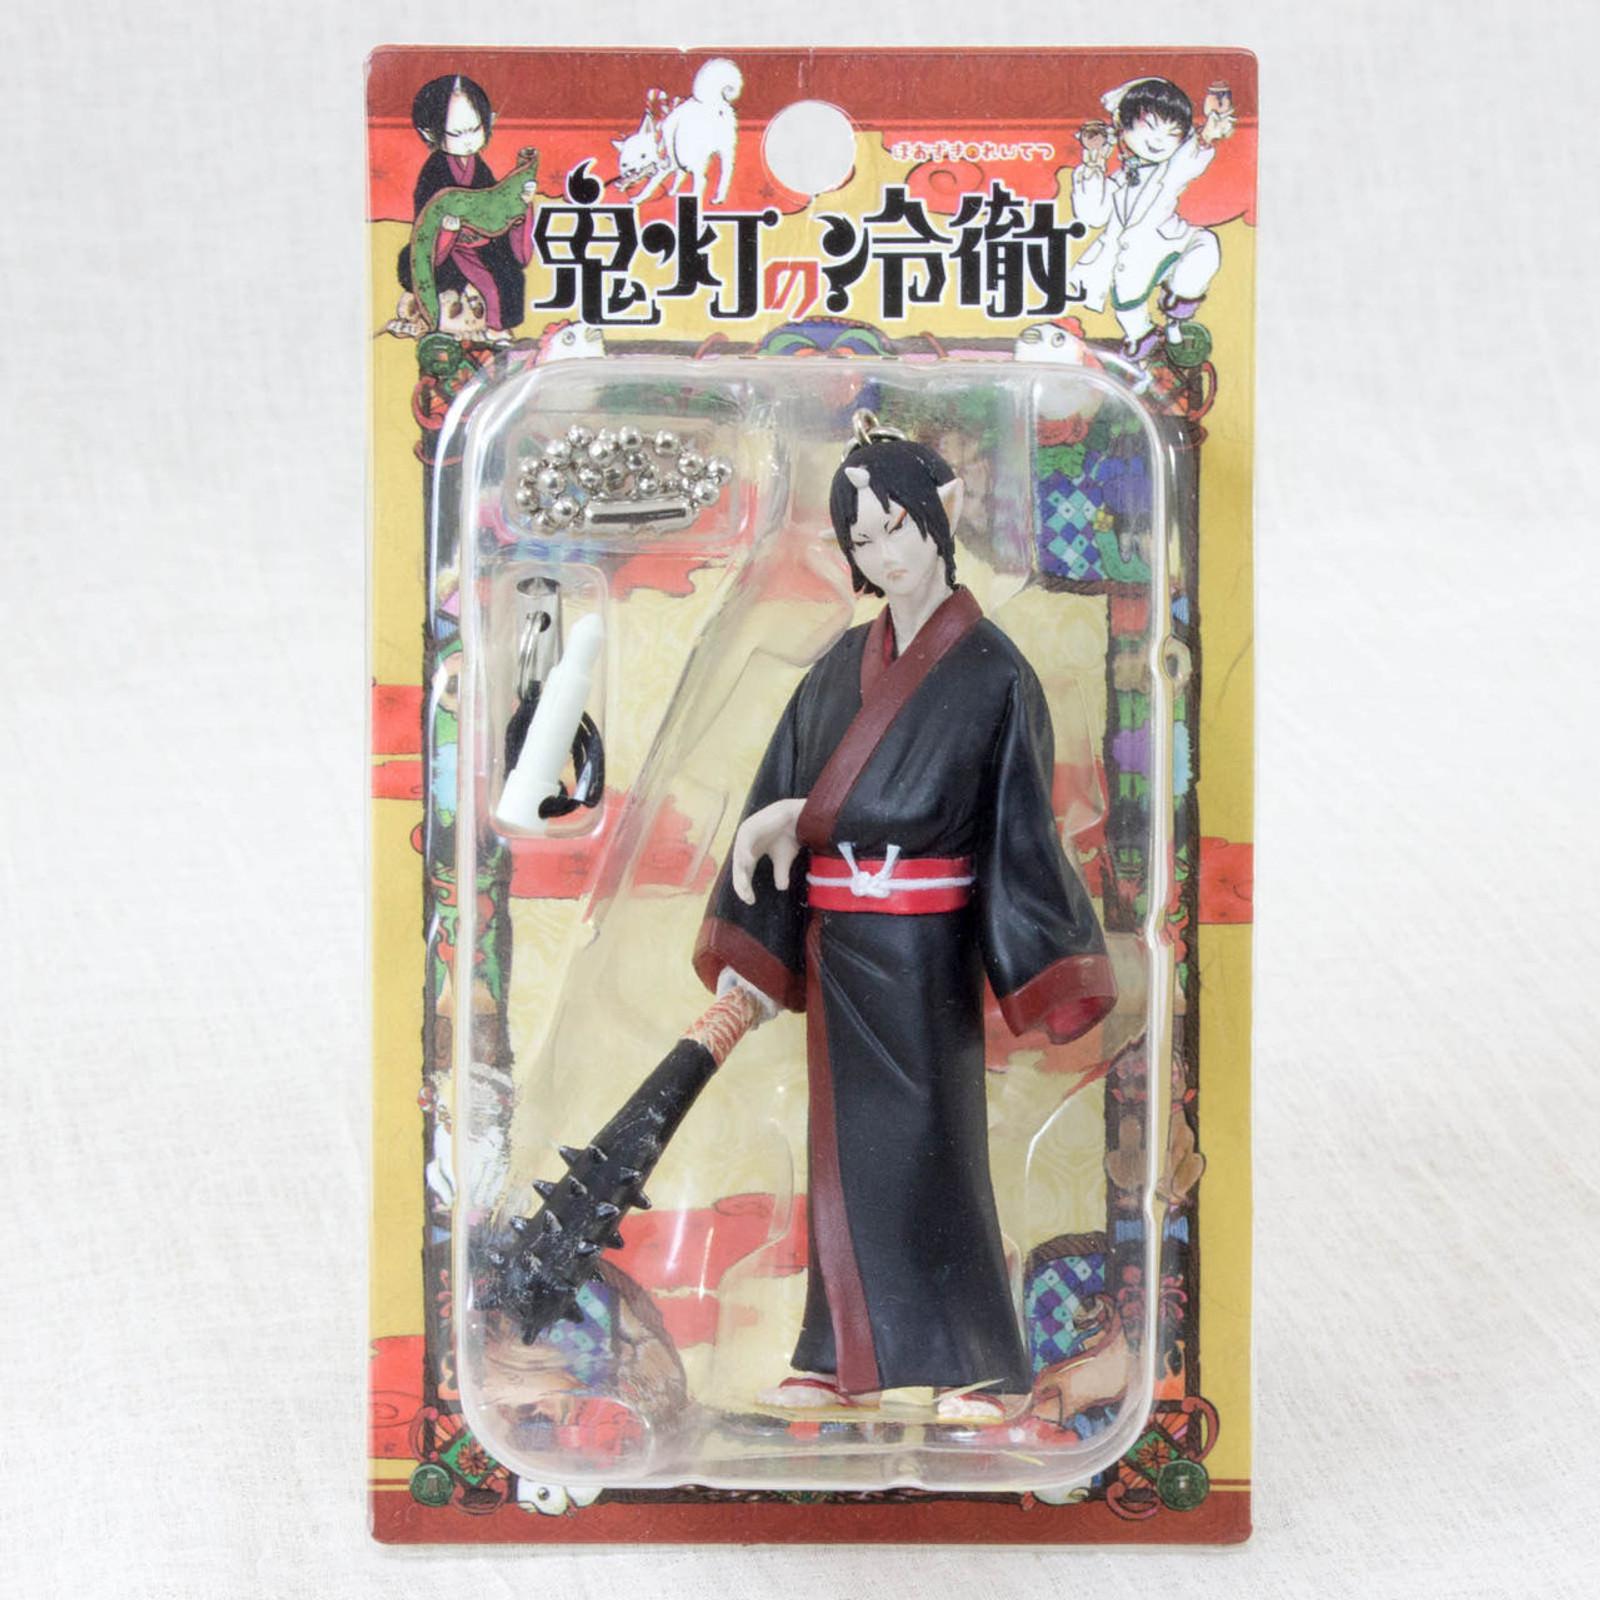 "Hoozuki no Reitetsu 3"" Figure Ballchain Strap Aile Planning JAPAN ANIME MANGA"